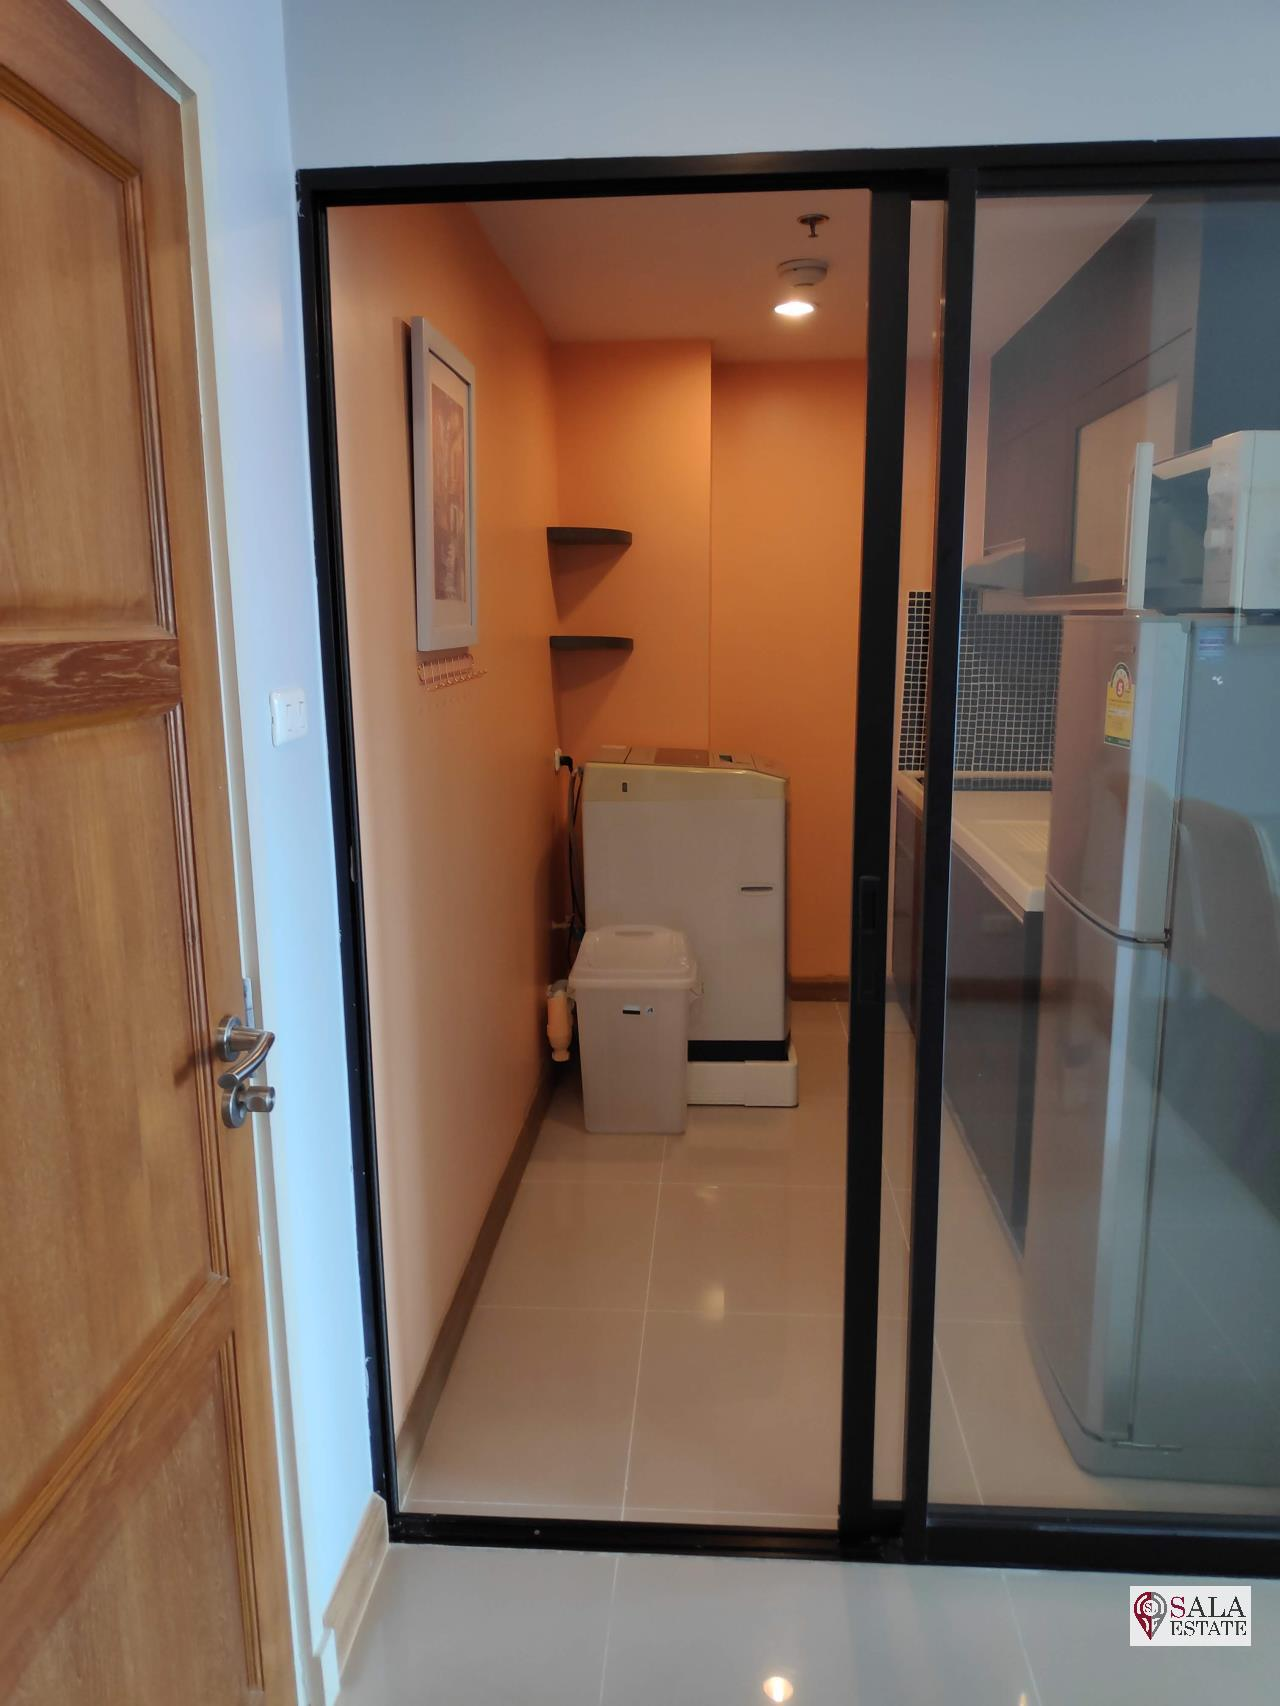 SALA ESTATE Agency's SUPALAI PREMIER NARATHIWAS – BTS CHONG NONSI, 1 BEDROOM 1 BATHROOM, FULLY FERNISHED, CITY VIEW 10